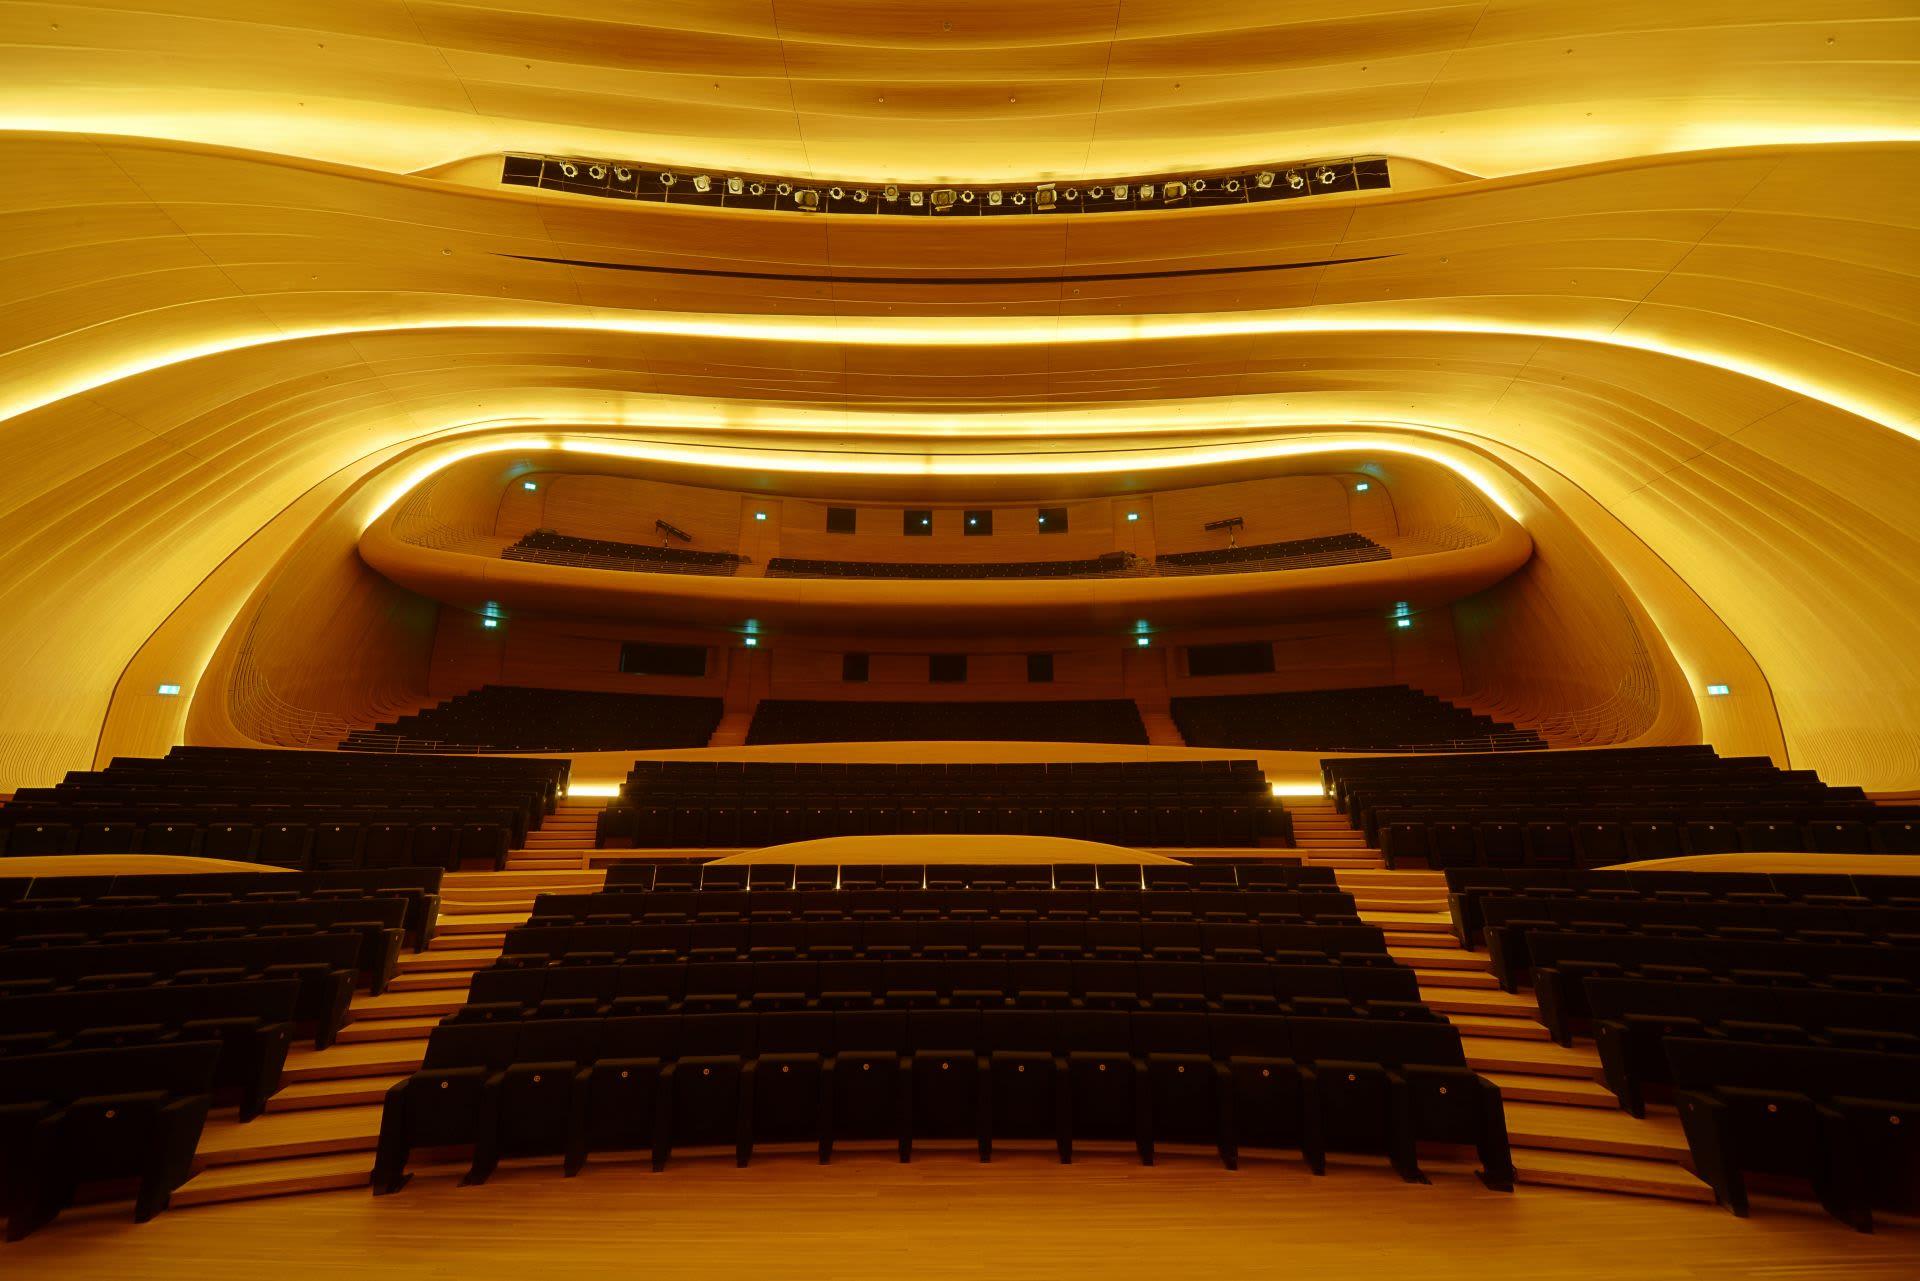 Interior Design by Mikodam Design seen at Heydar Aliyev Centre, Bakı - Heydar Aliyev Center Auditorium, Acoustic Design